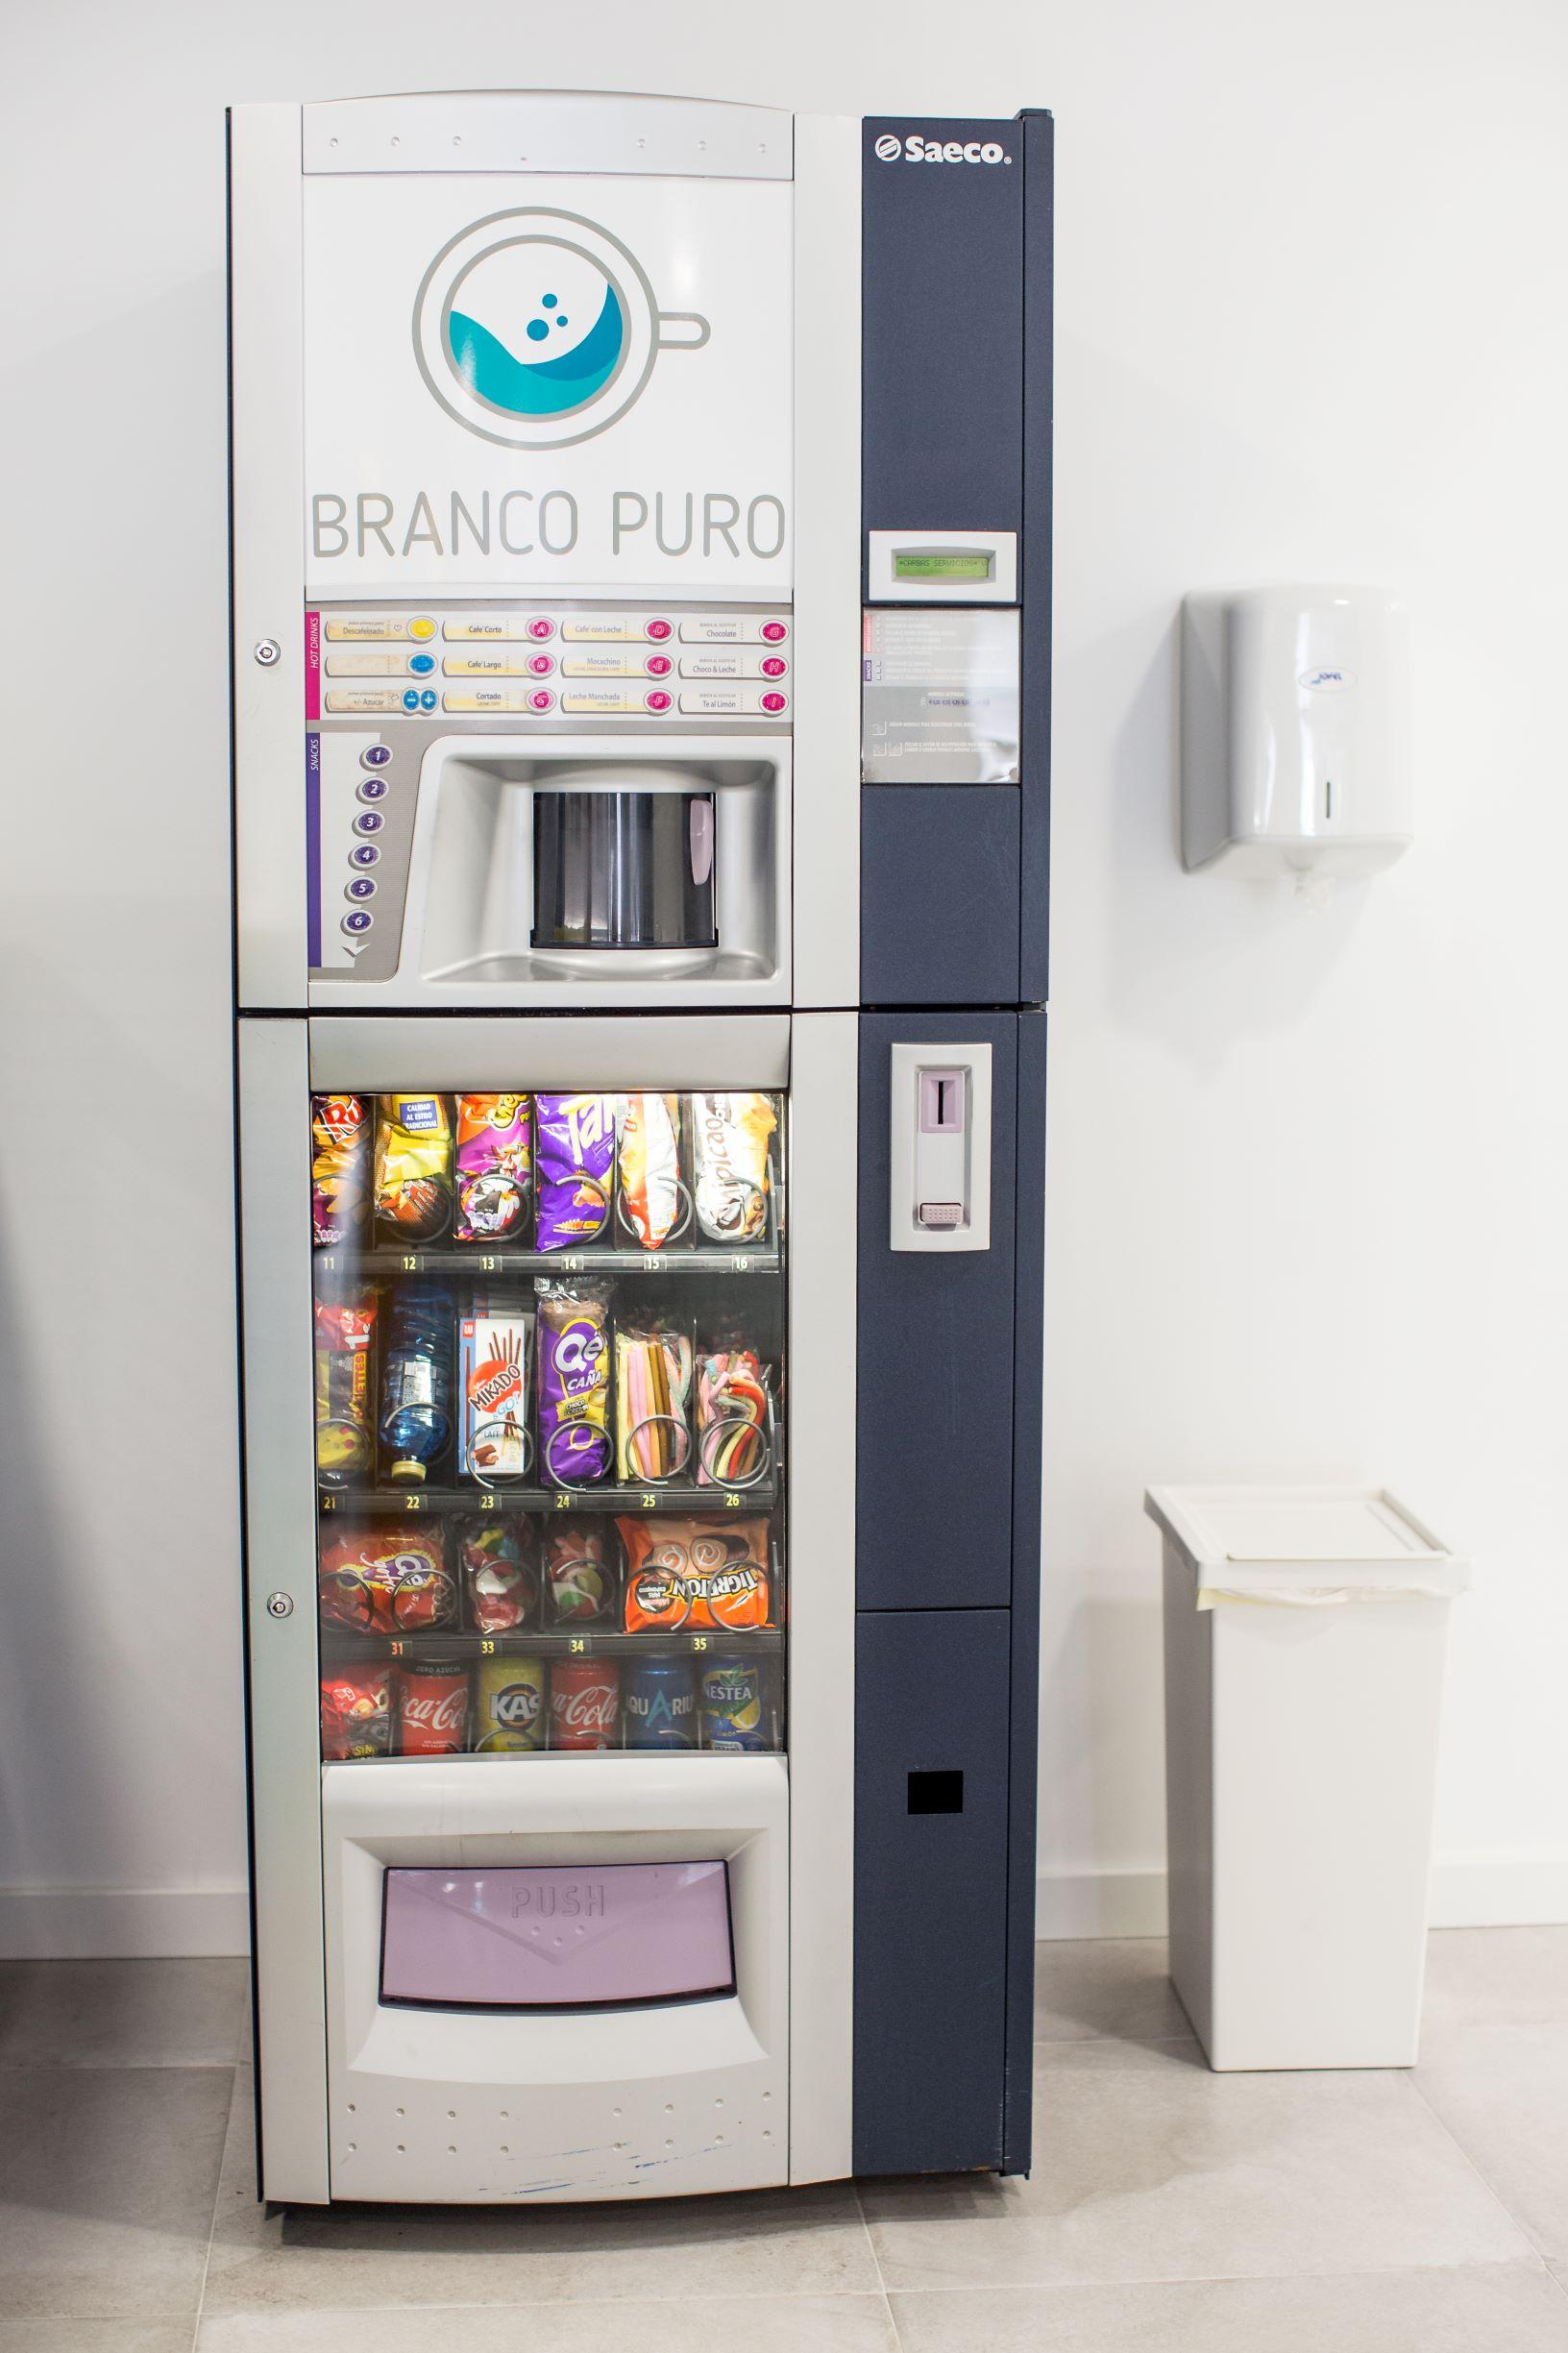 lavanderia con vending